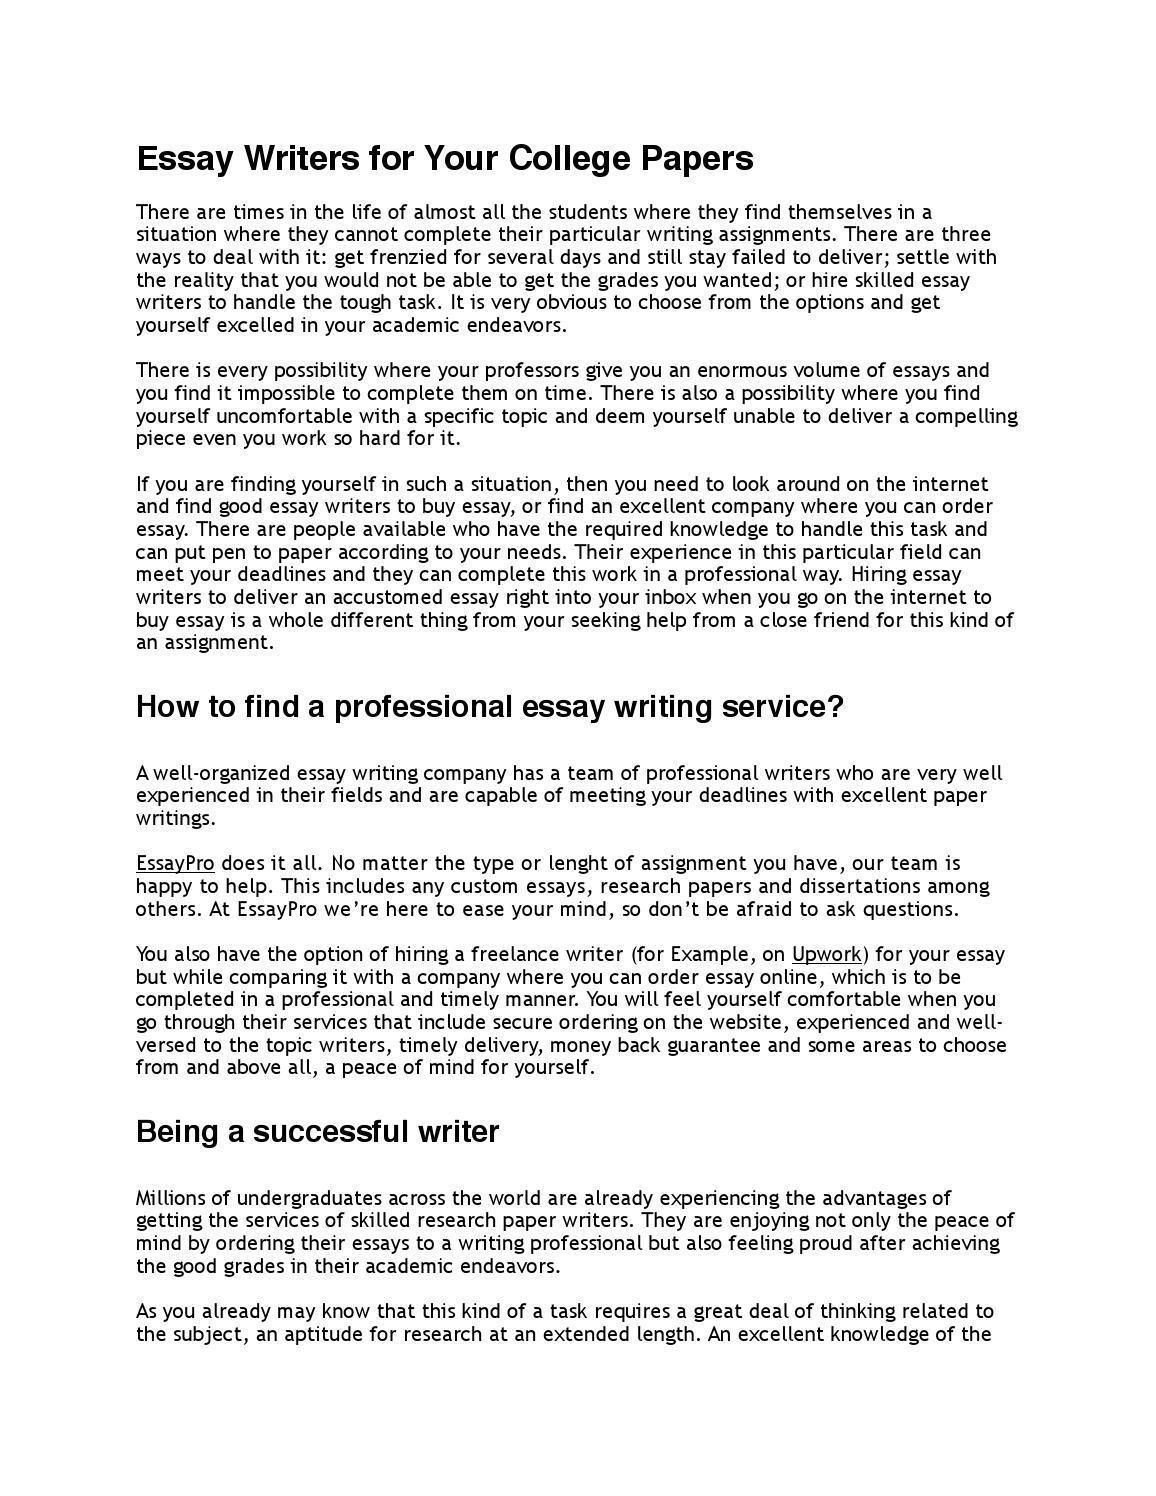 006 Who Are You Essay Page 1fit11562c1496ssl1 Rare Question Describe Full